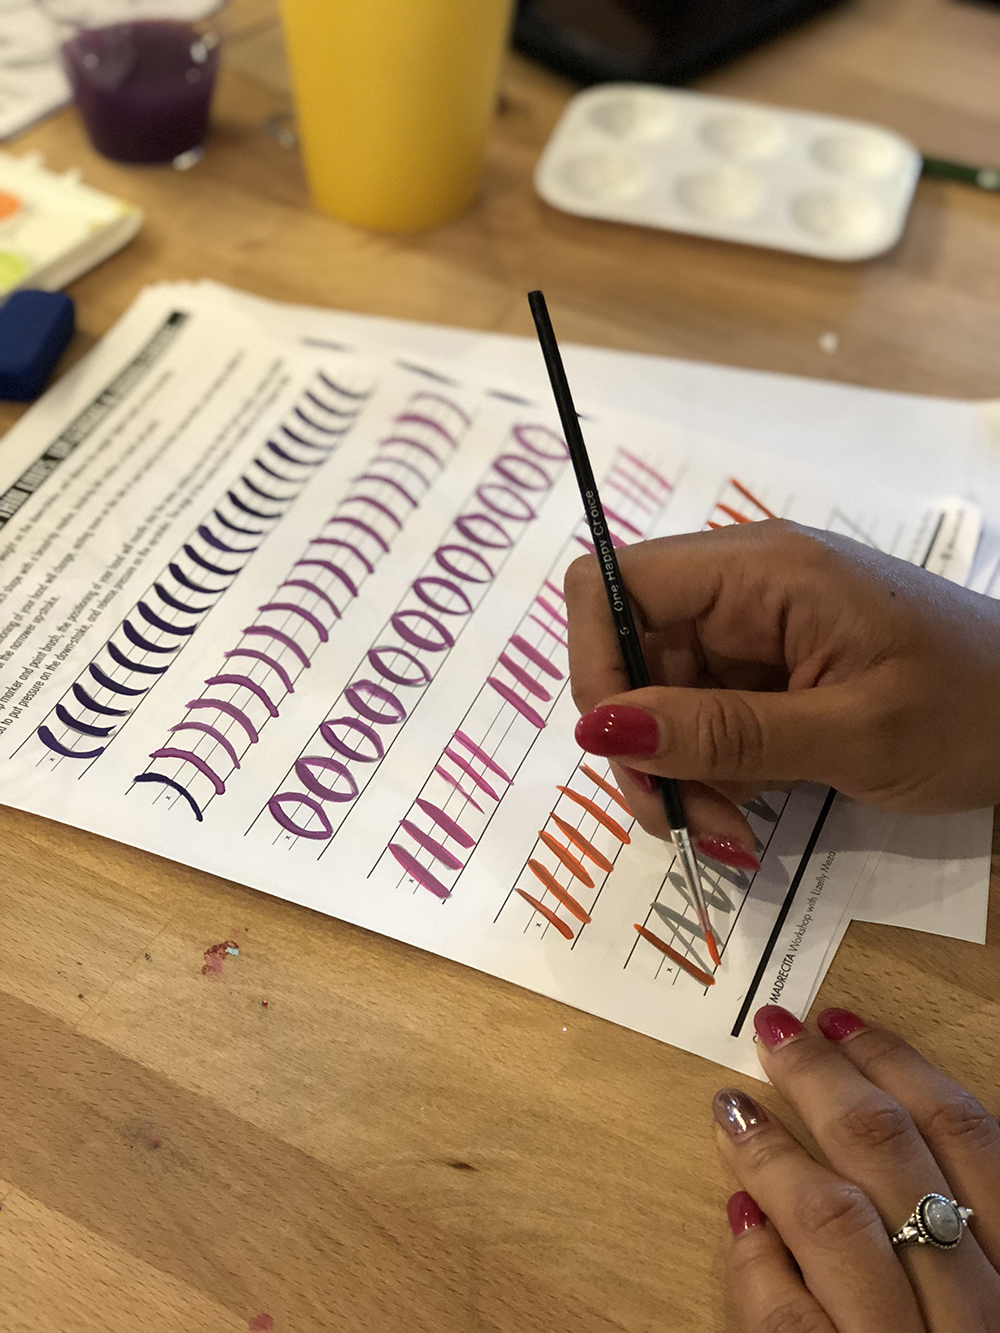 Creating Your Gratitude & Appreciation Art—A Workshop // Curiosities Allowed // Creative blog of Lizelly Meza